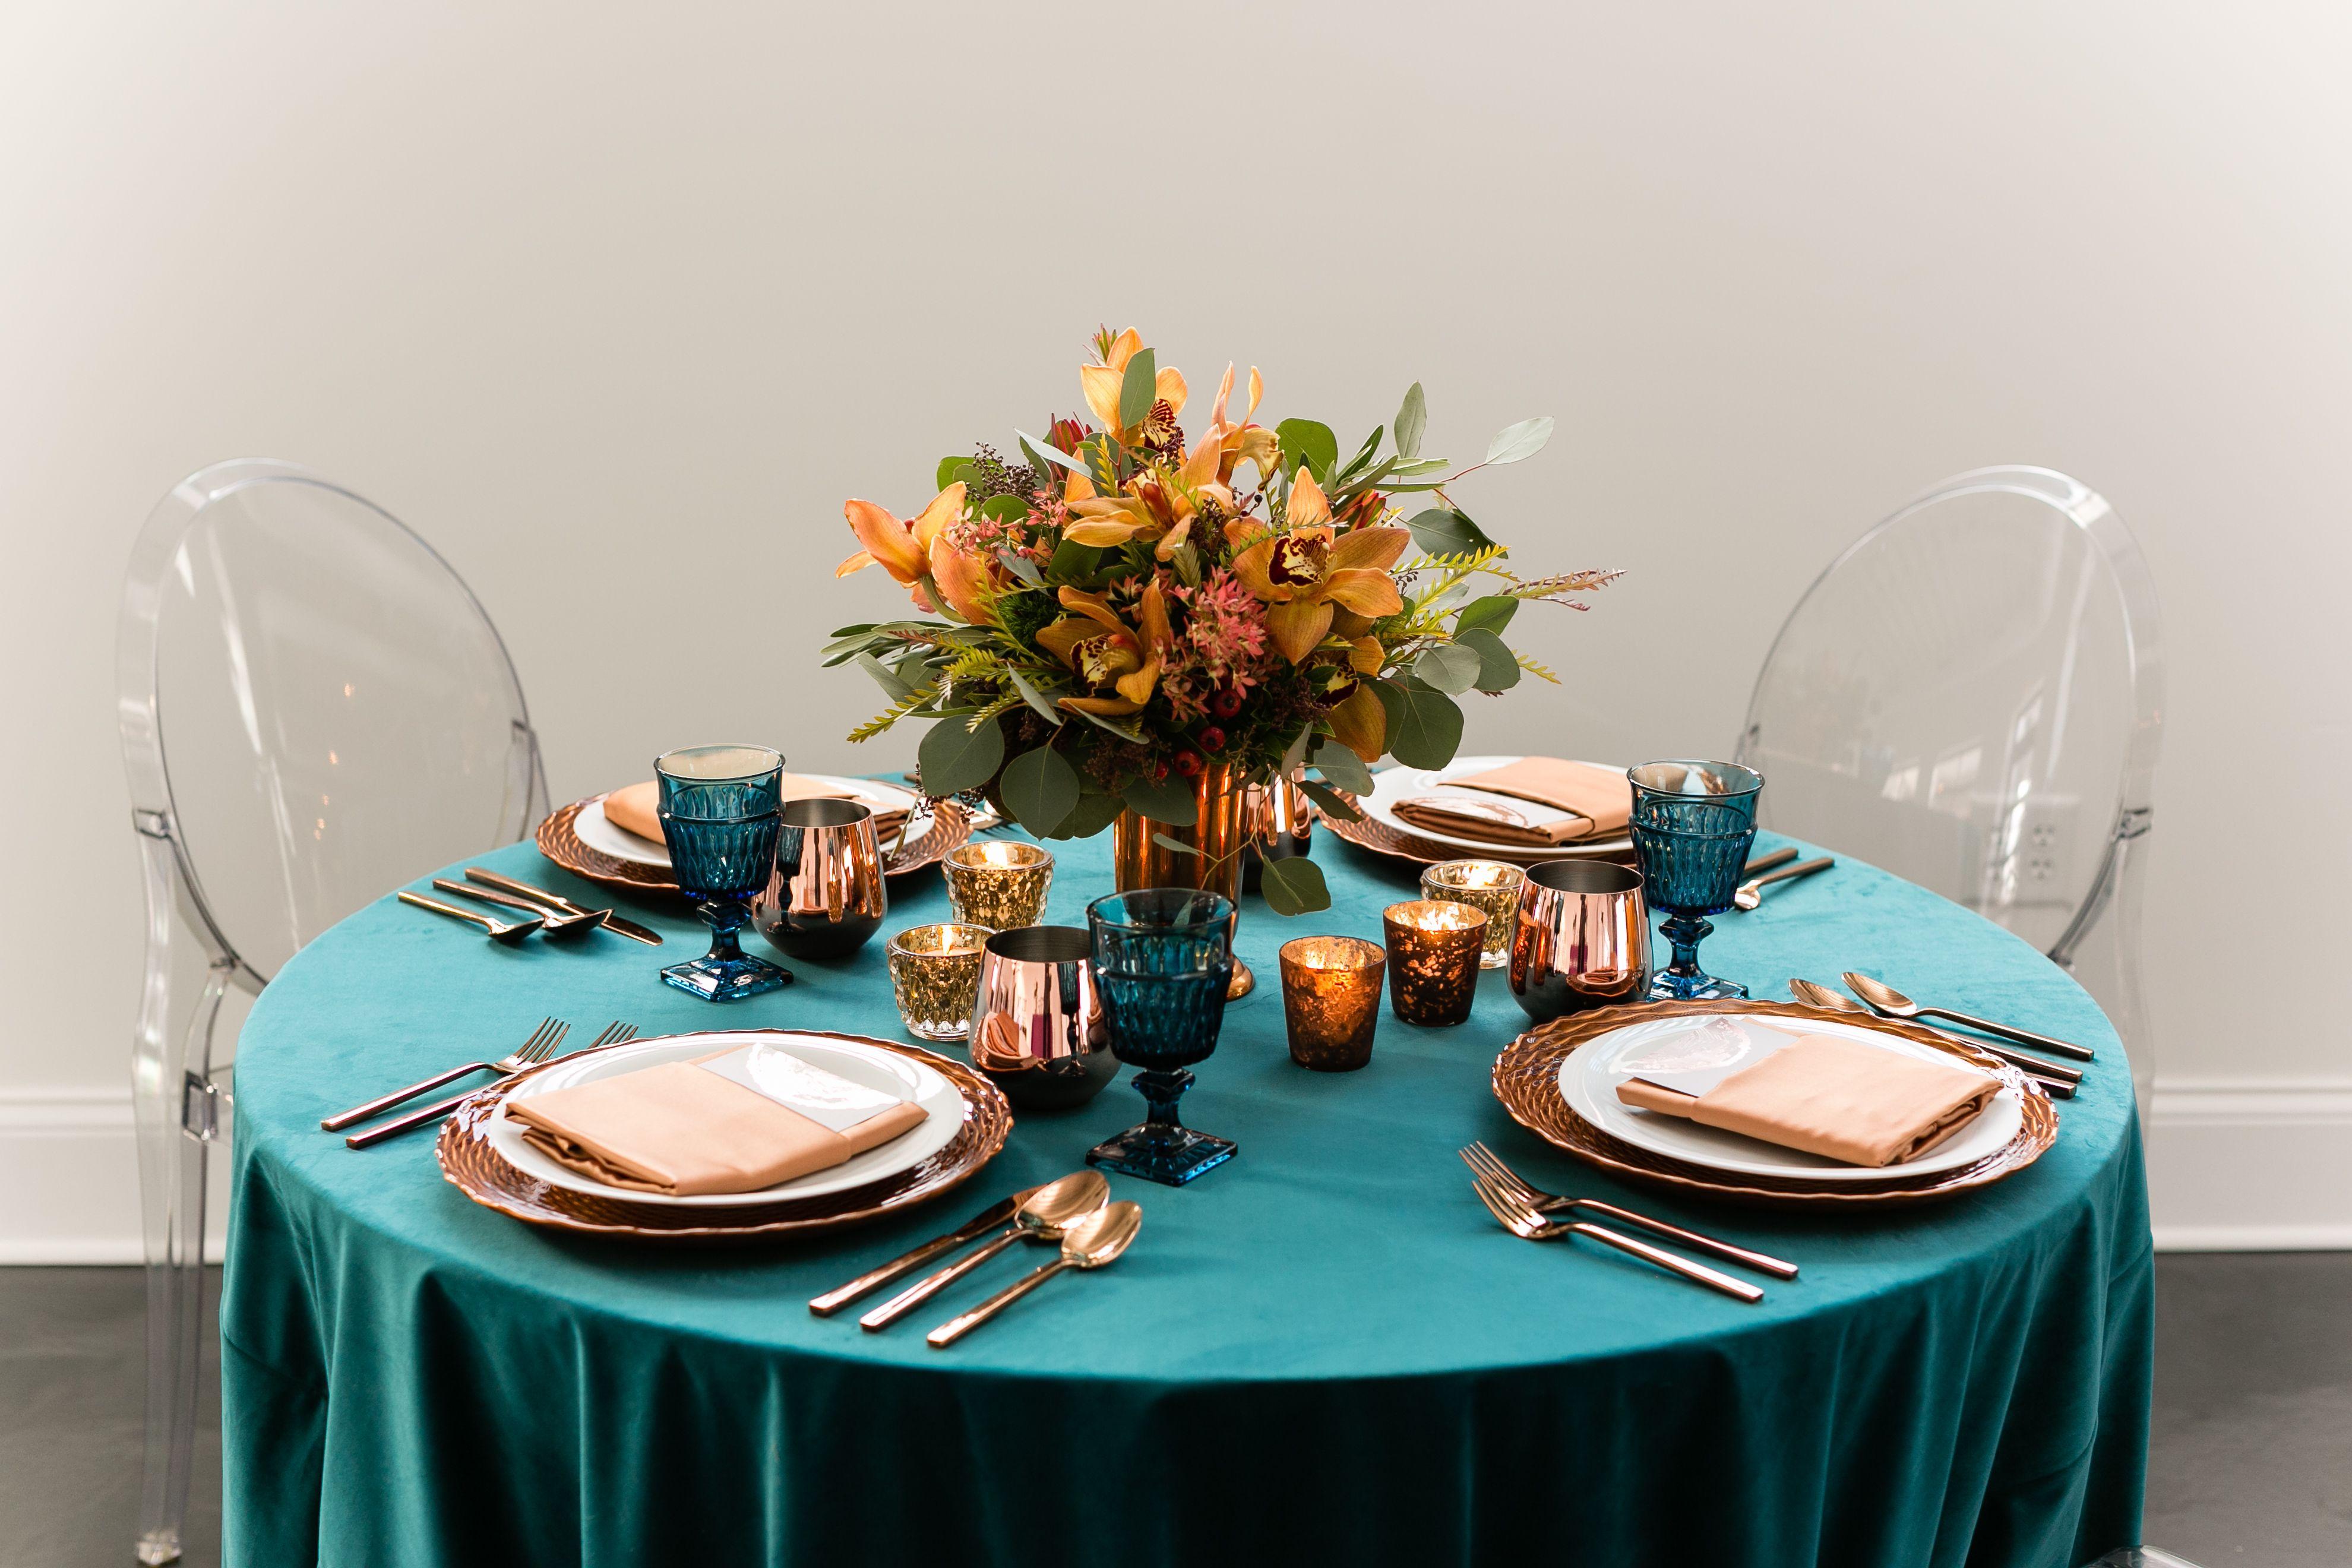 Chartreuse Velvet Table Linen Teal Table Pumpkin Candlesticks Event Decor